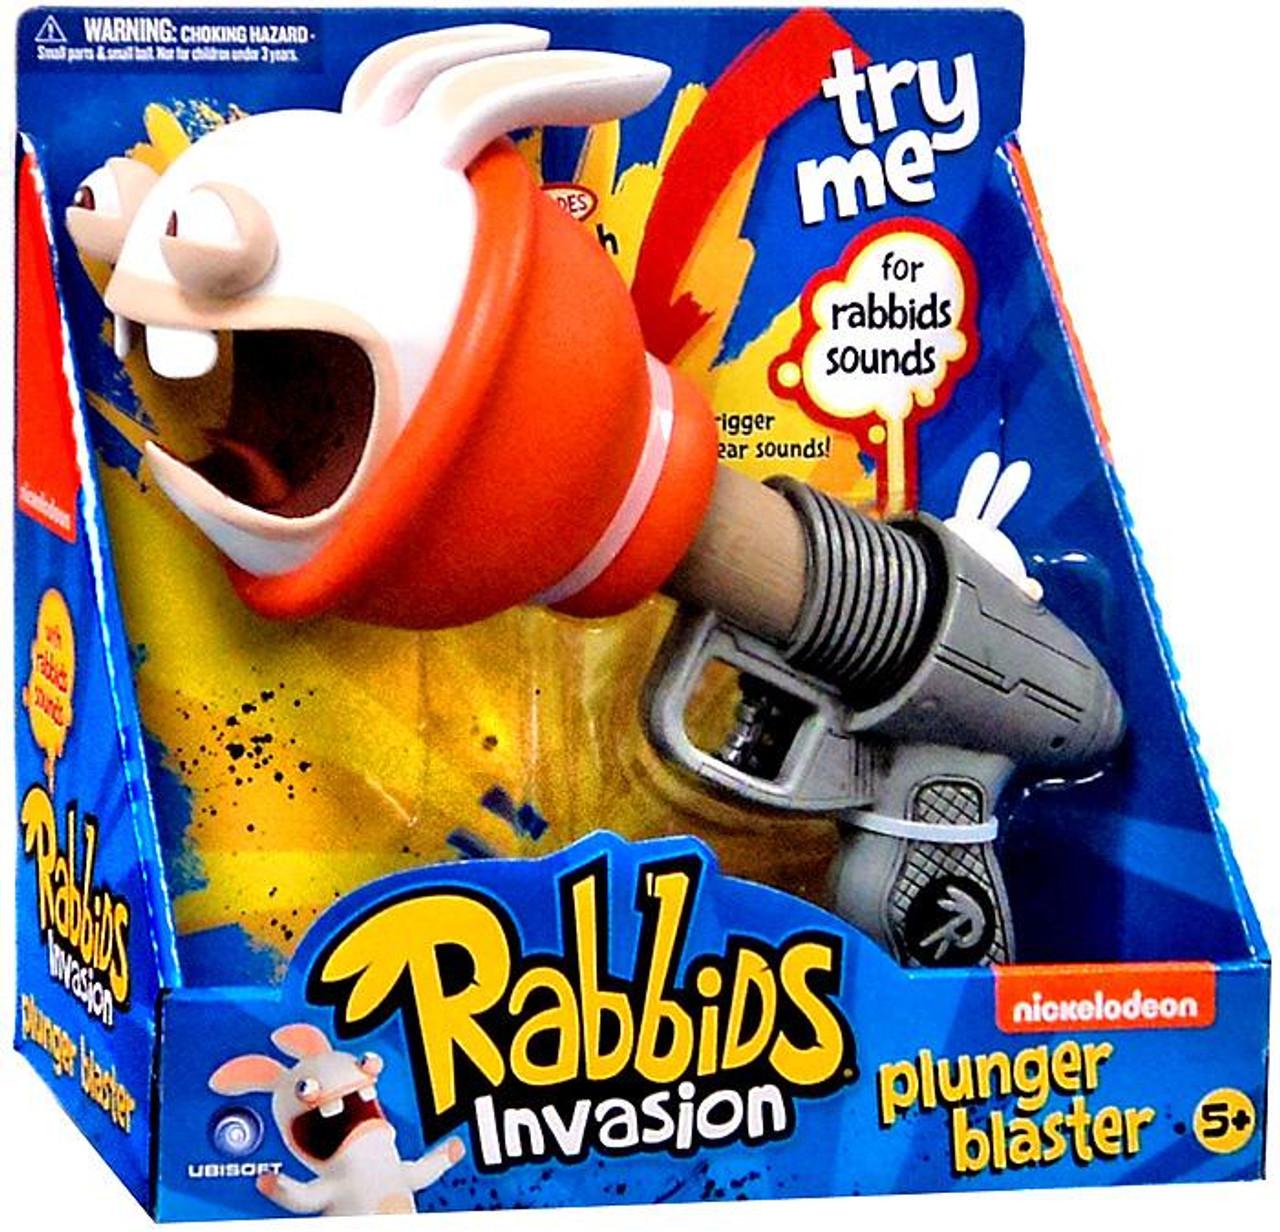 Raving Rabbids Rabbids Invasion Plunger Blaster Roleplay Toy